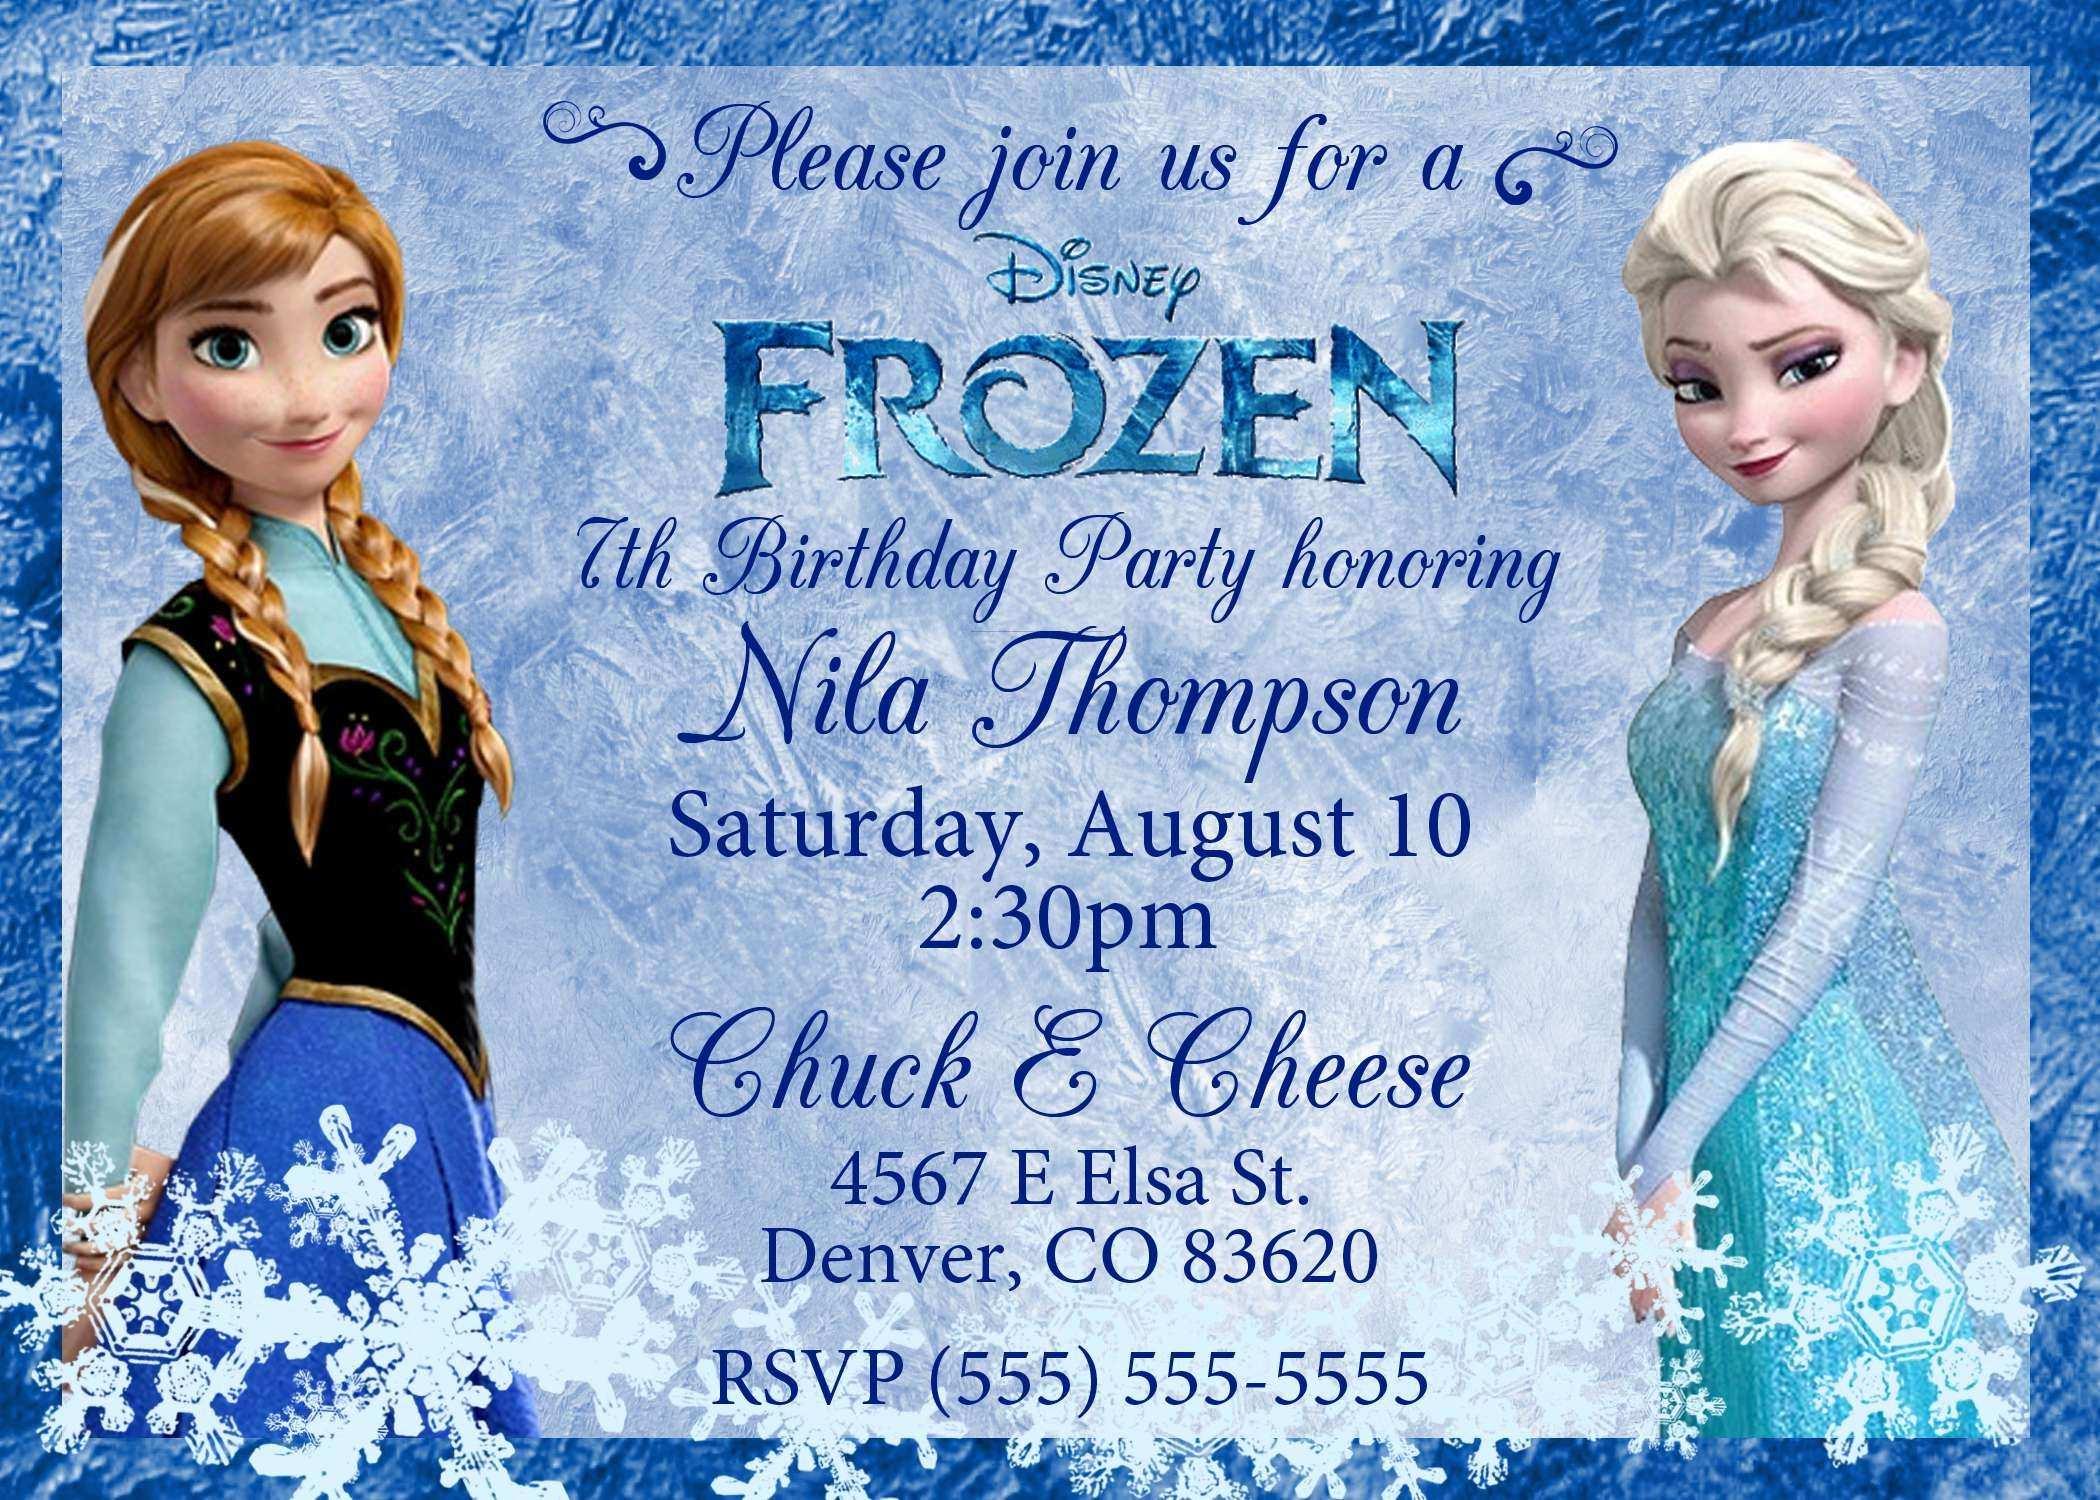 20 Blank Birthday Invitation Template Frozen For Free with Birthday Invitation Template Frozen